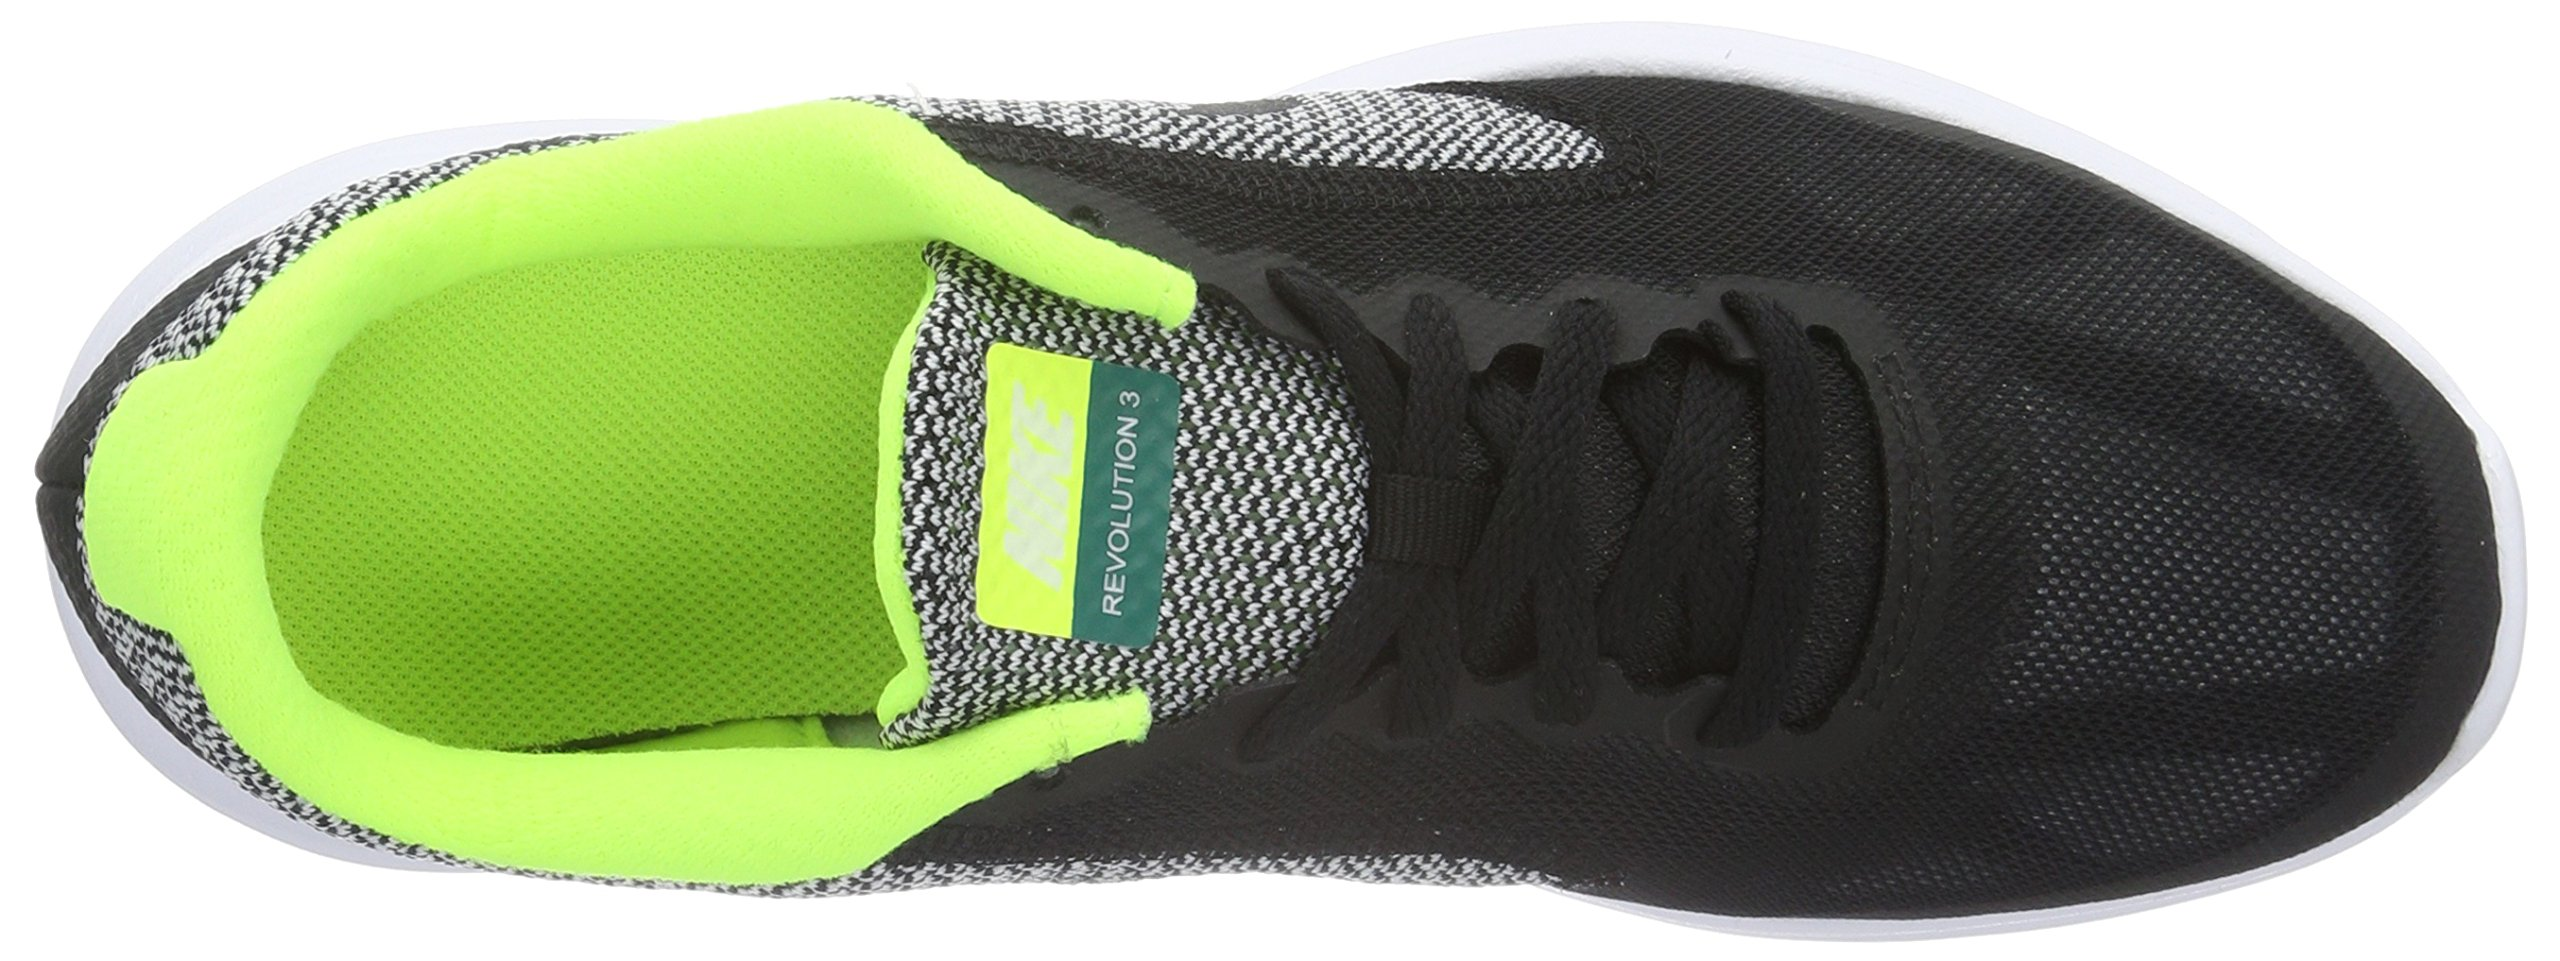 Nike Boys' Revolution 3 (GS) Running Shoe Black/White/Volt, 4.5 M US Big Kid by Nike (Image #7)